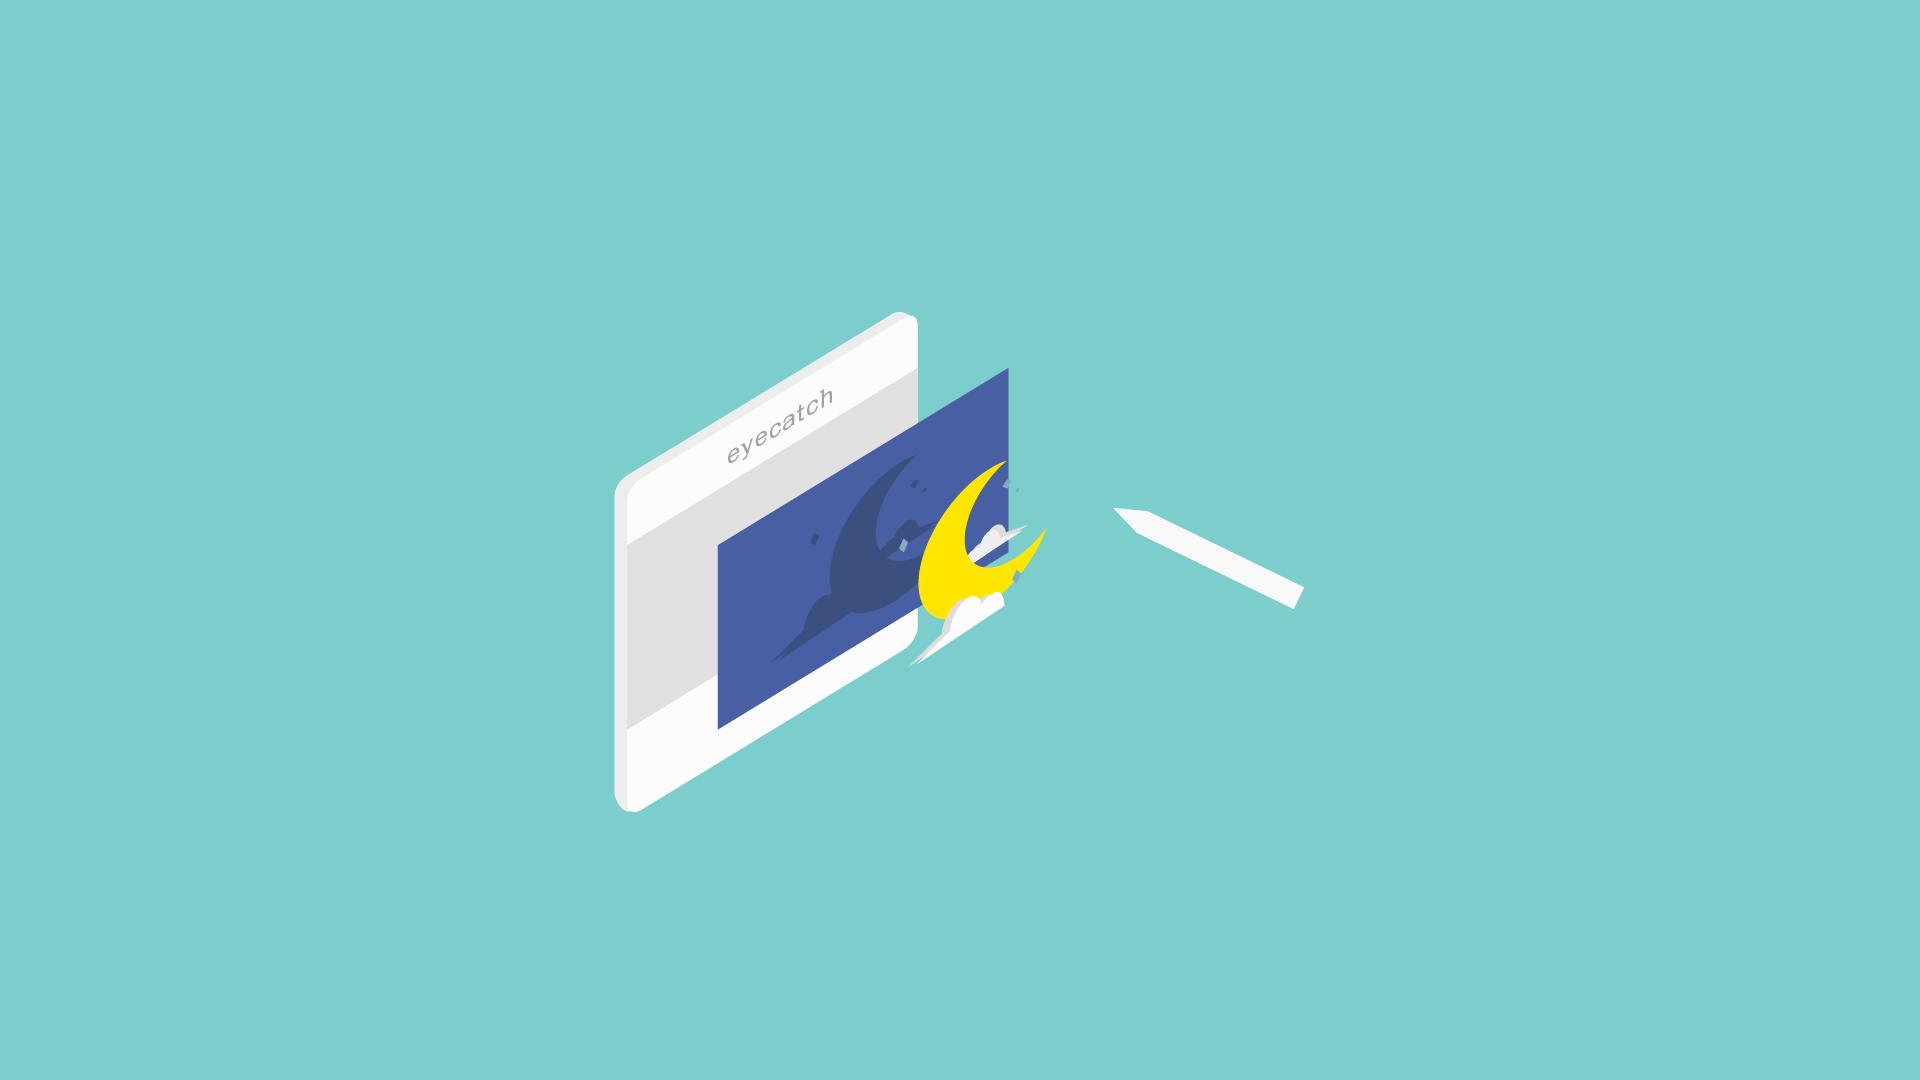 【cocoro流】ブログのアイキャッチ画像の作り方とおすすめフリー素材サイト